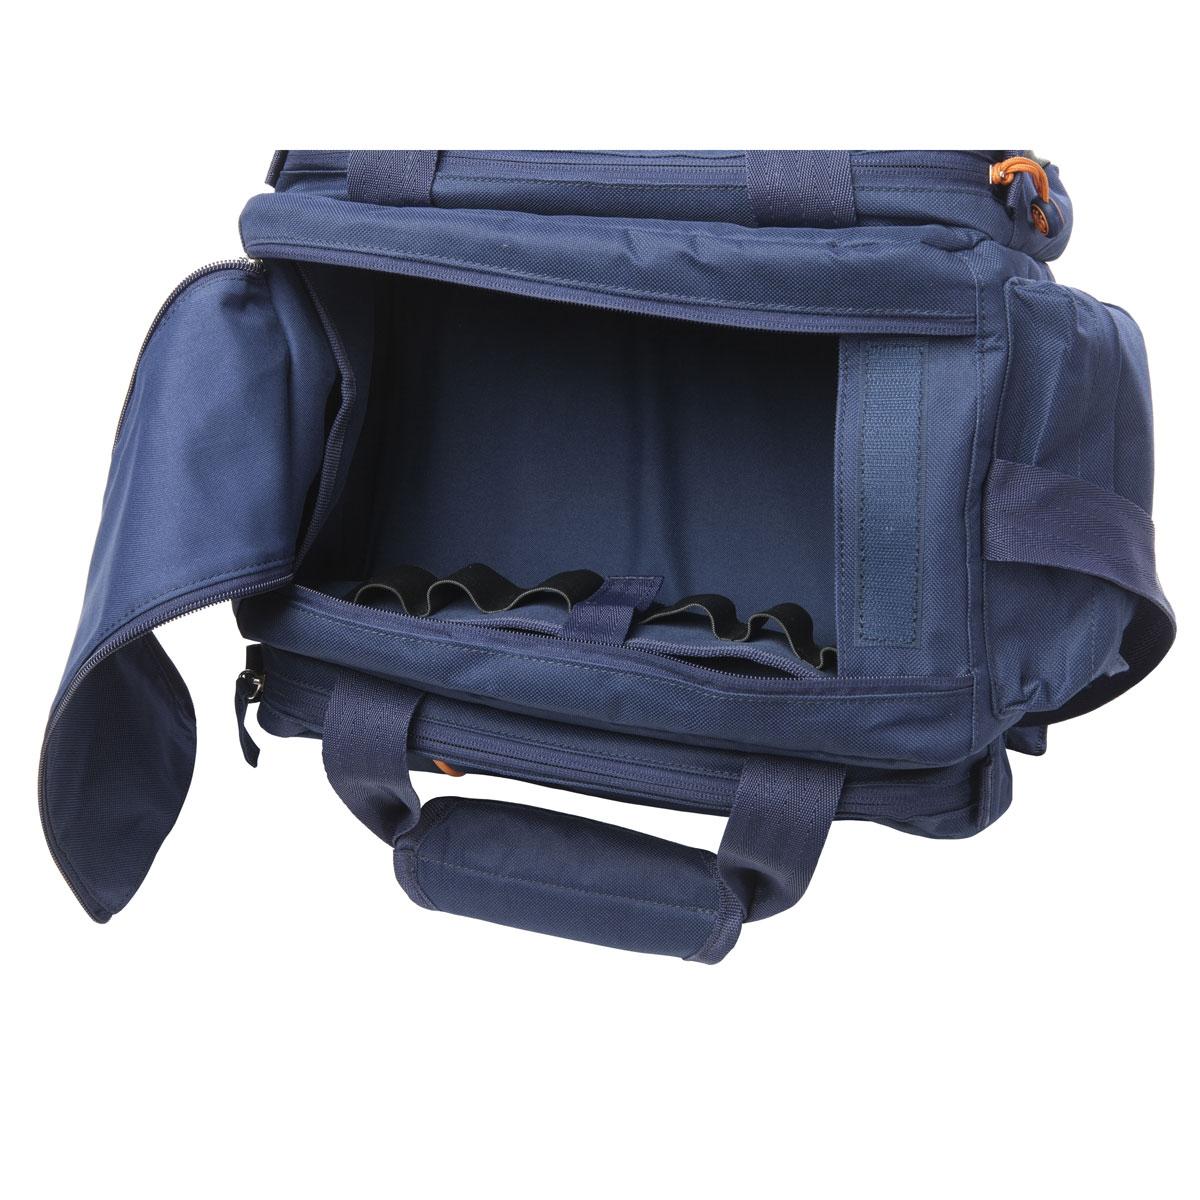 ... Image of Beretta Uniform Pro Cartridge Bag - 10 Boxes - Blue